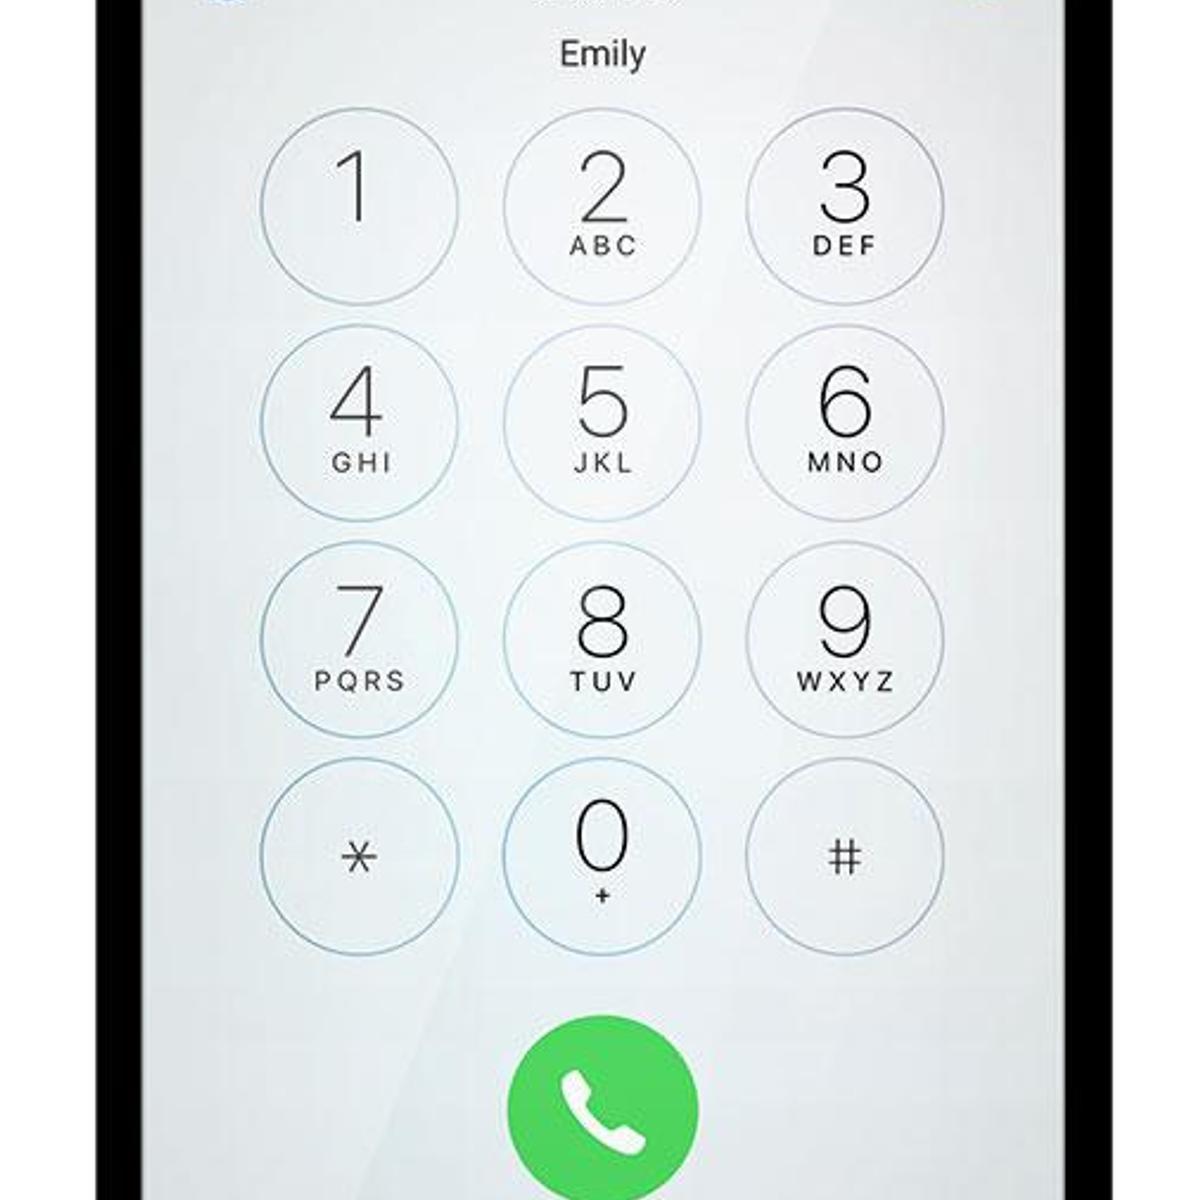 OS9 Phone Dialer Alternatives and Similar Apps - AlternativeTo net